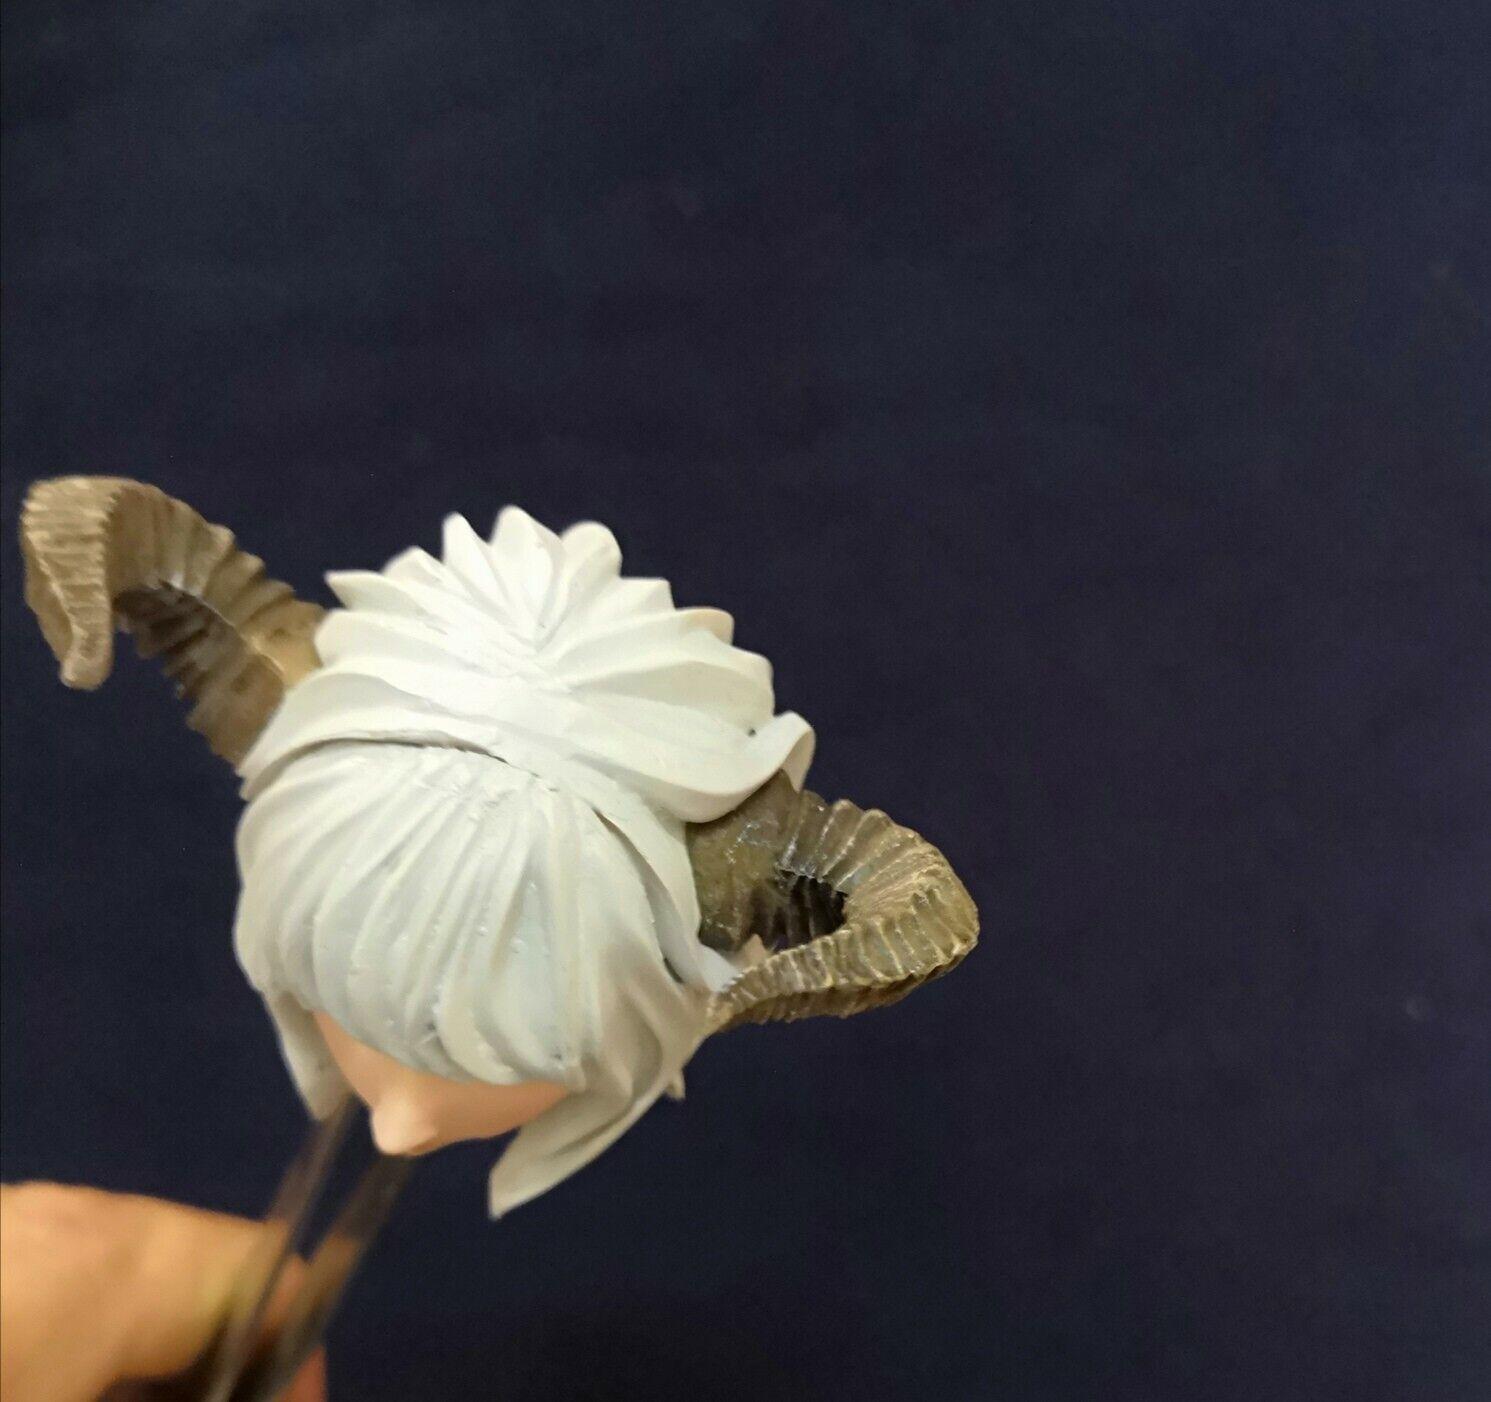 1 6 Beauty Pale Pale Pale Anime Elf Girl Head Sculpt With Horn Fit 12'' Figure 2a9068